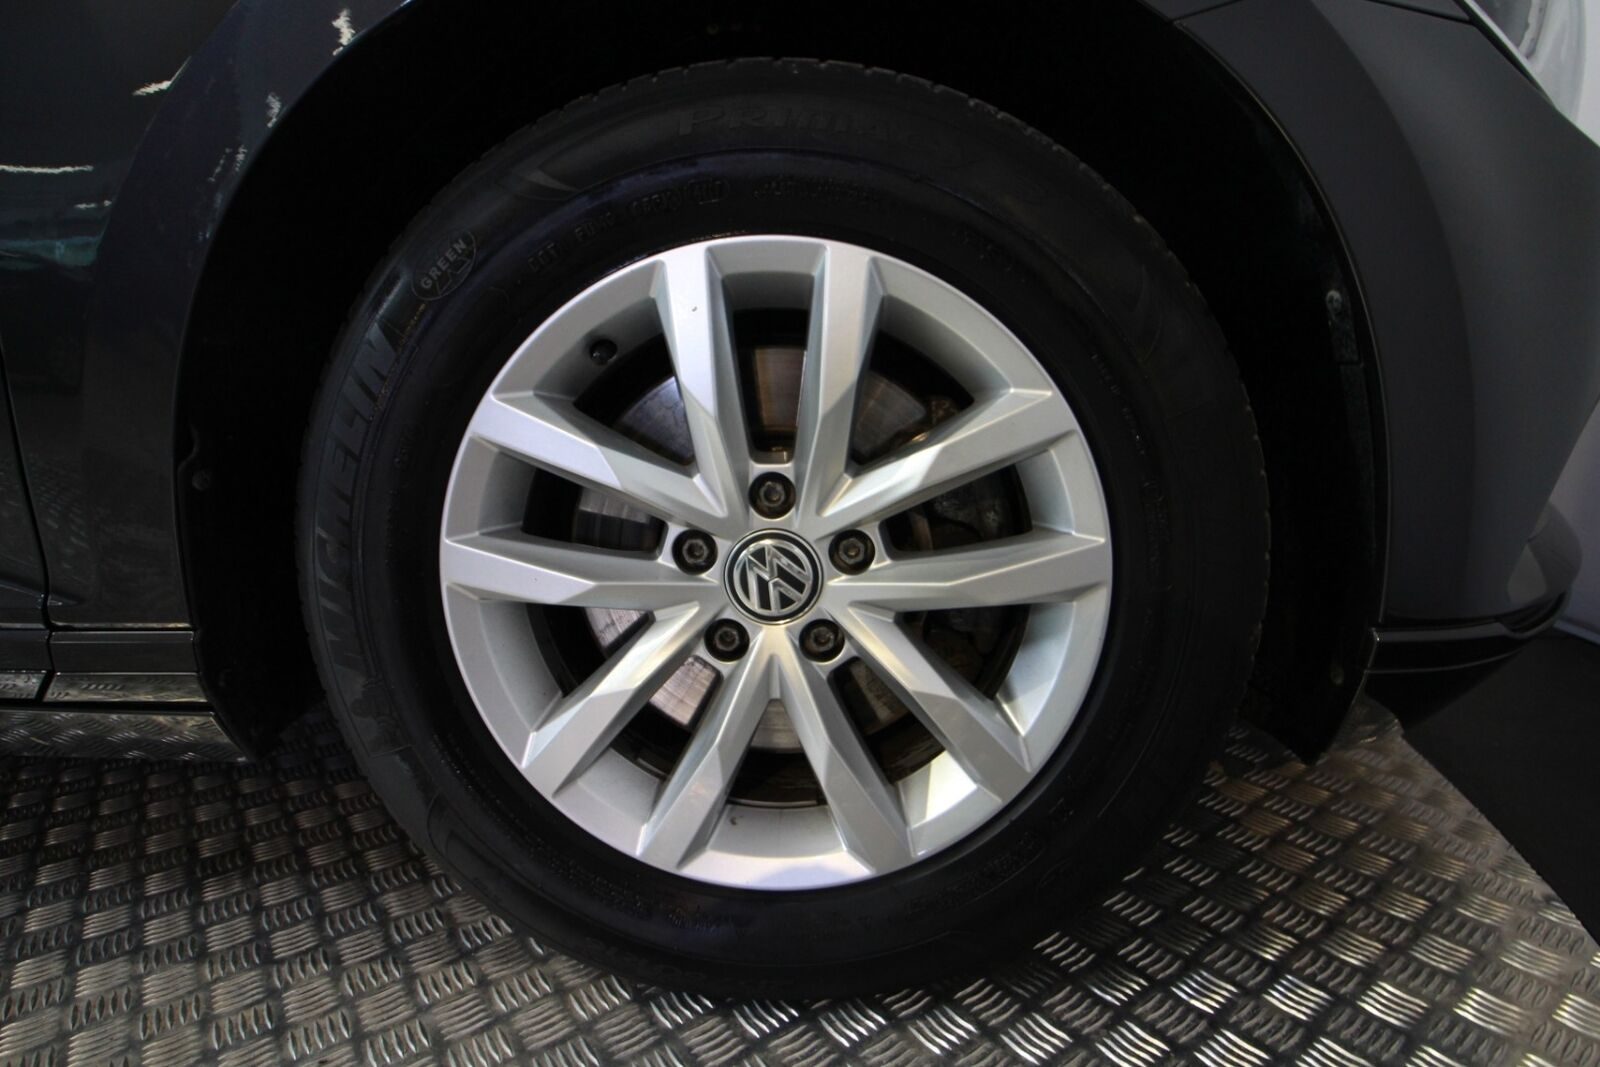 VW Passat TSi 150 Comfortline Premium Variant DSG